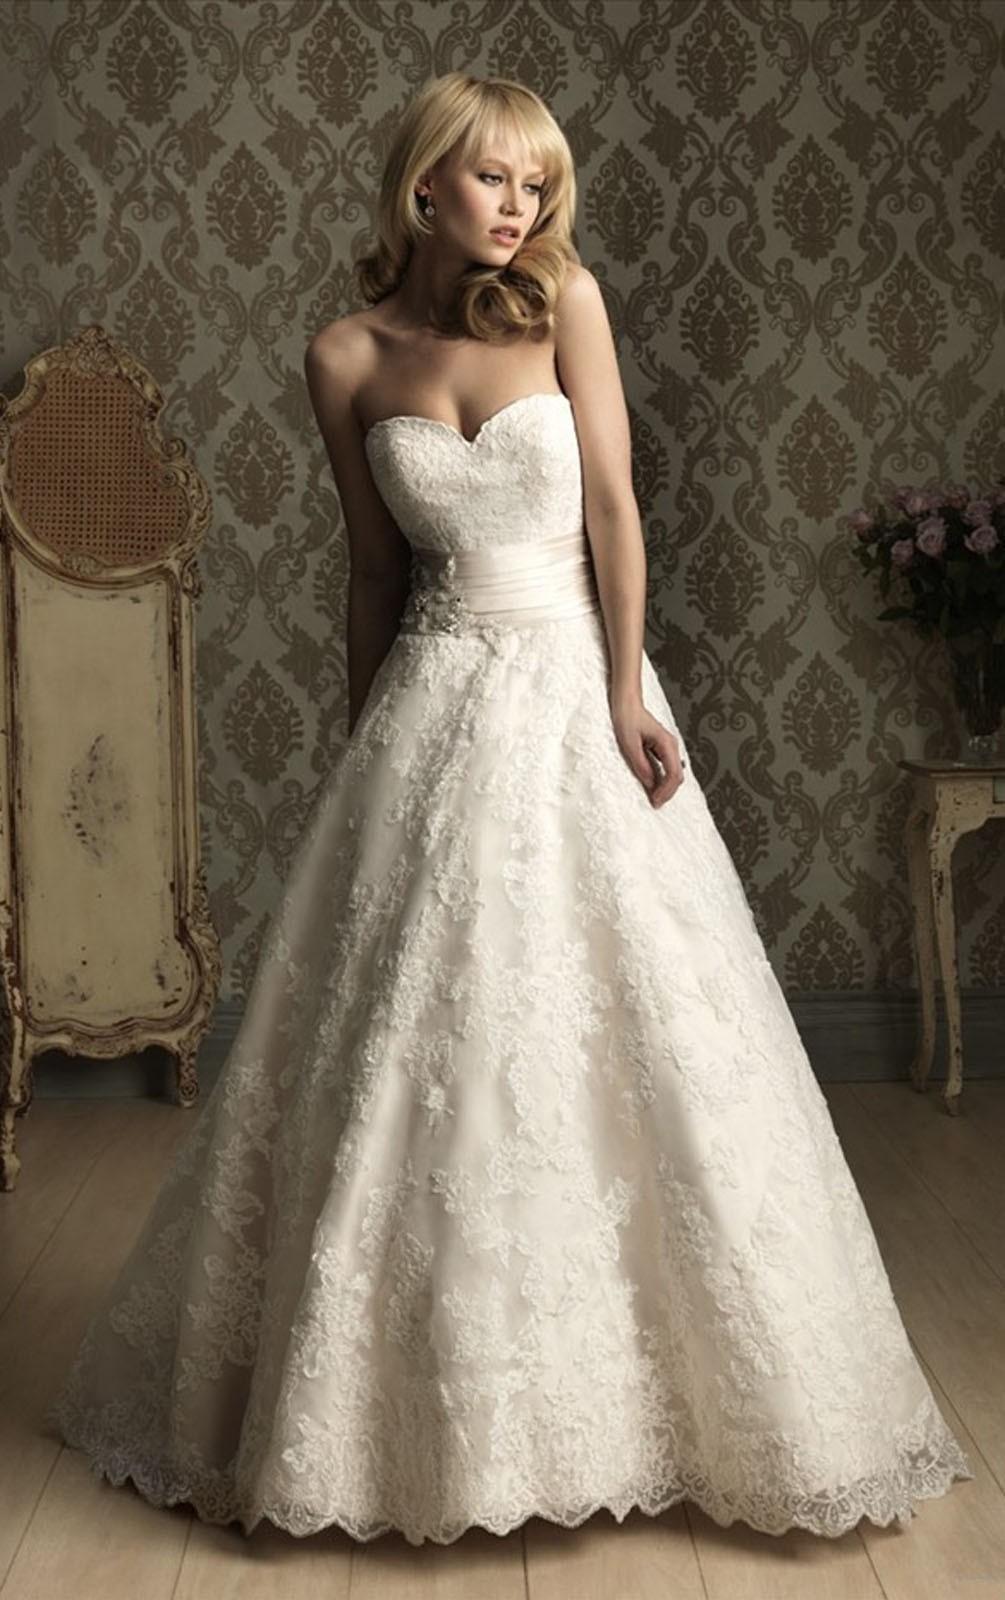 wedding dresses princess petite wedding dresses petite Wedding Dresses Princess Petite